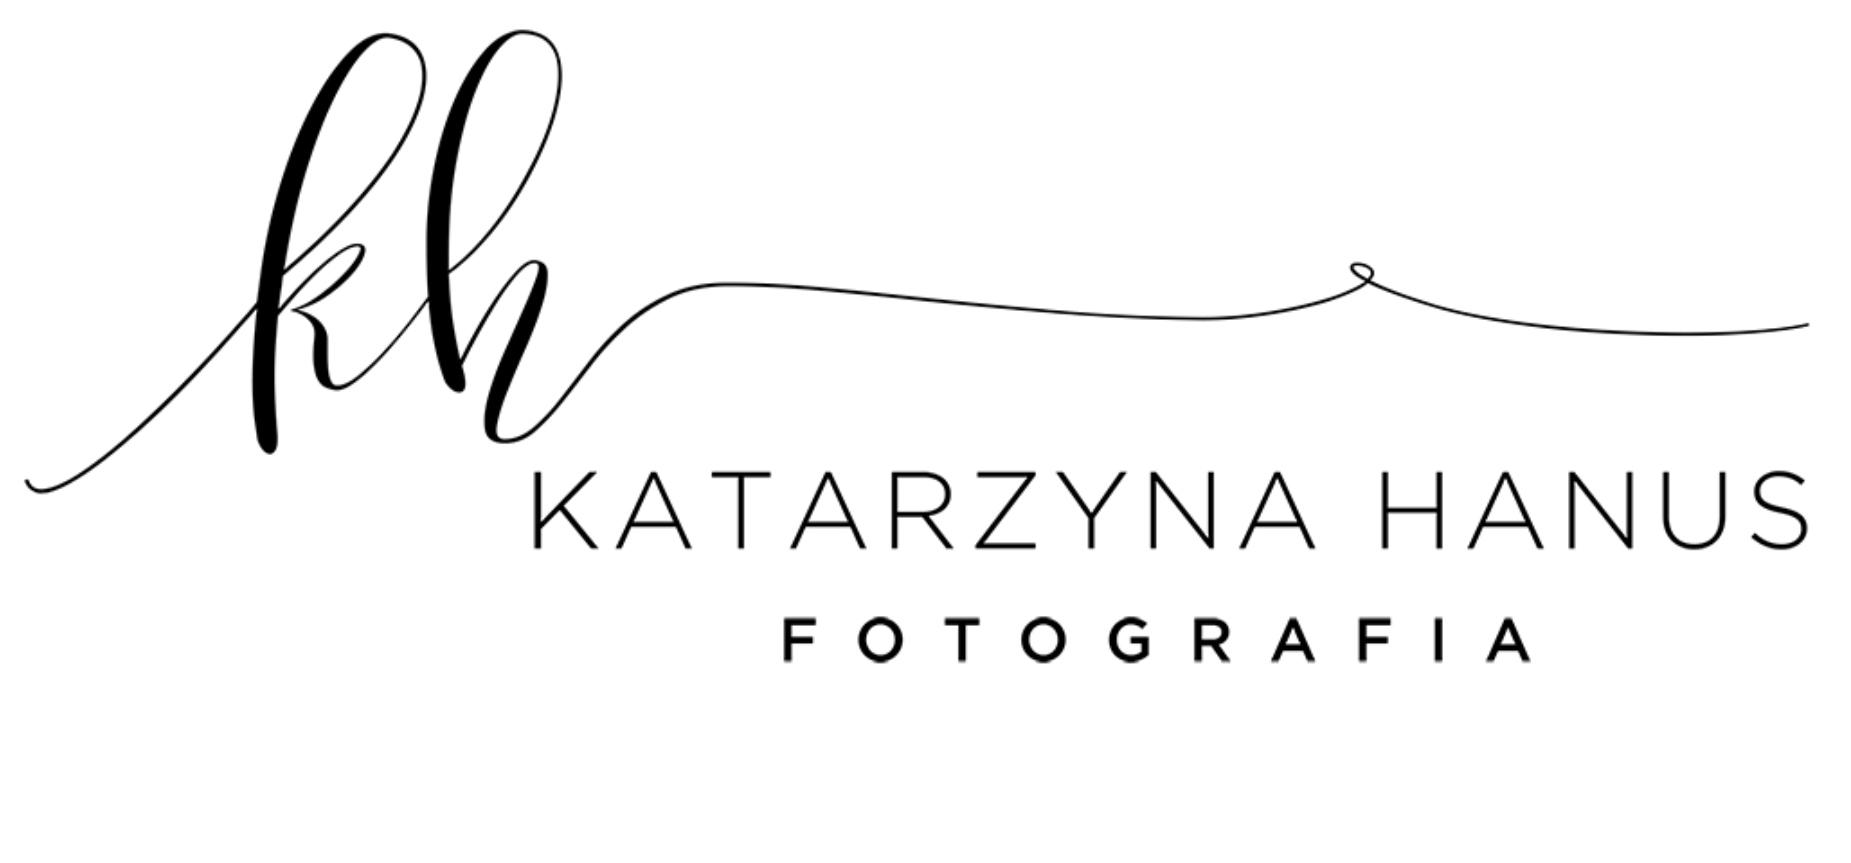 katarzyna hanus fotografia logo